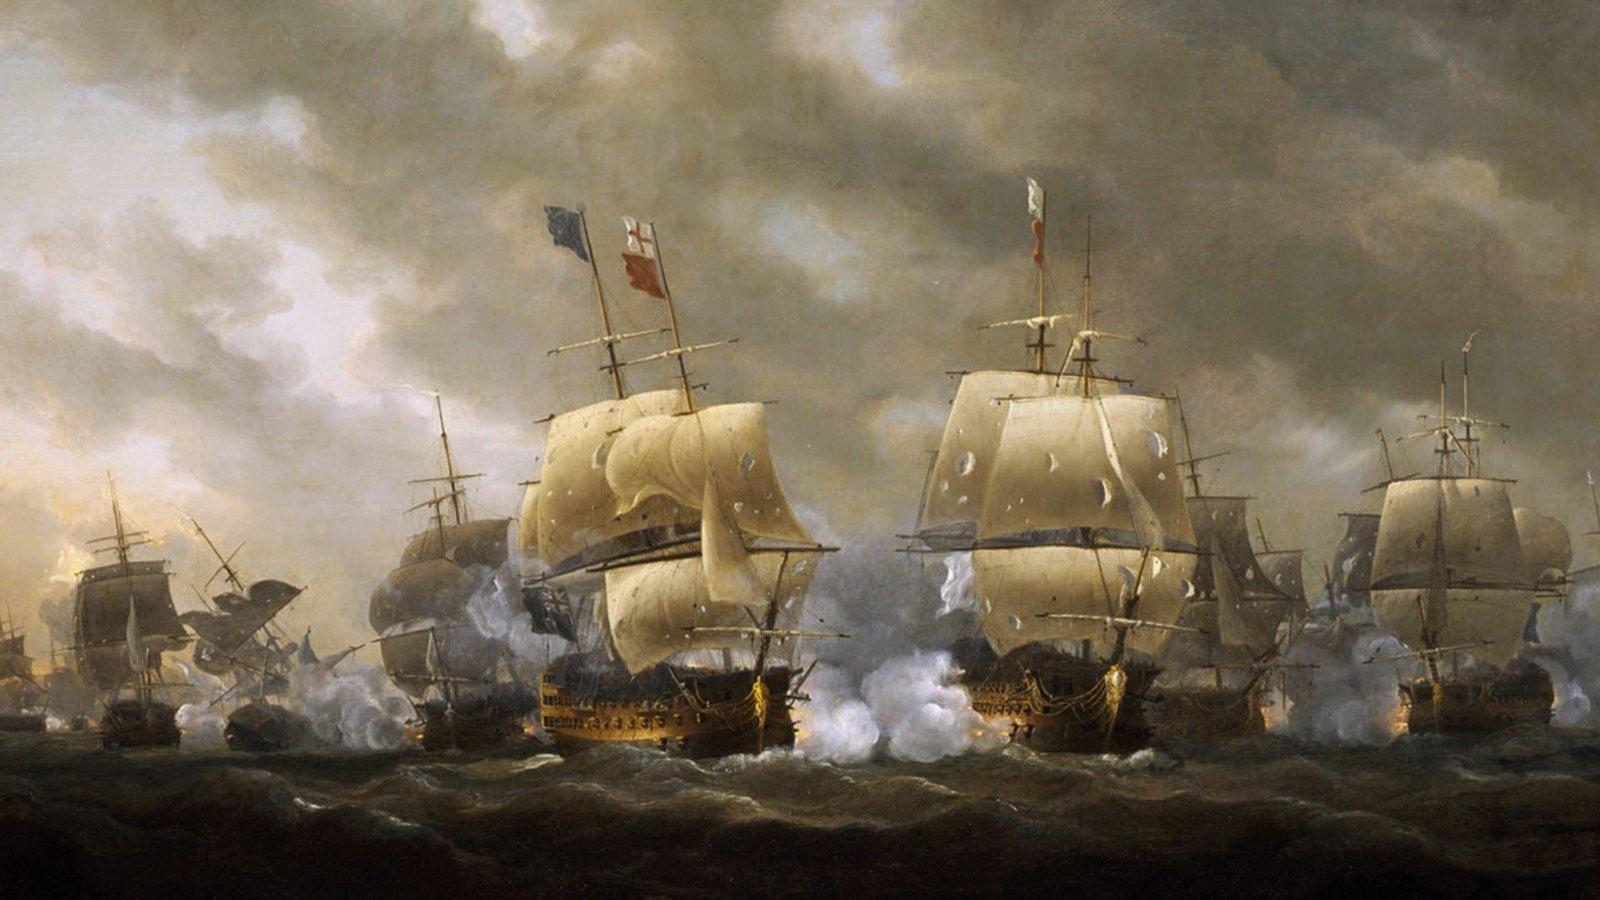 The American Revolution - Howe's War